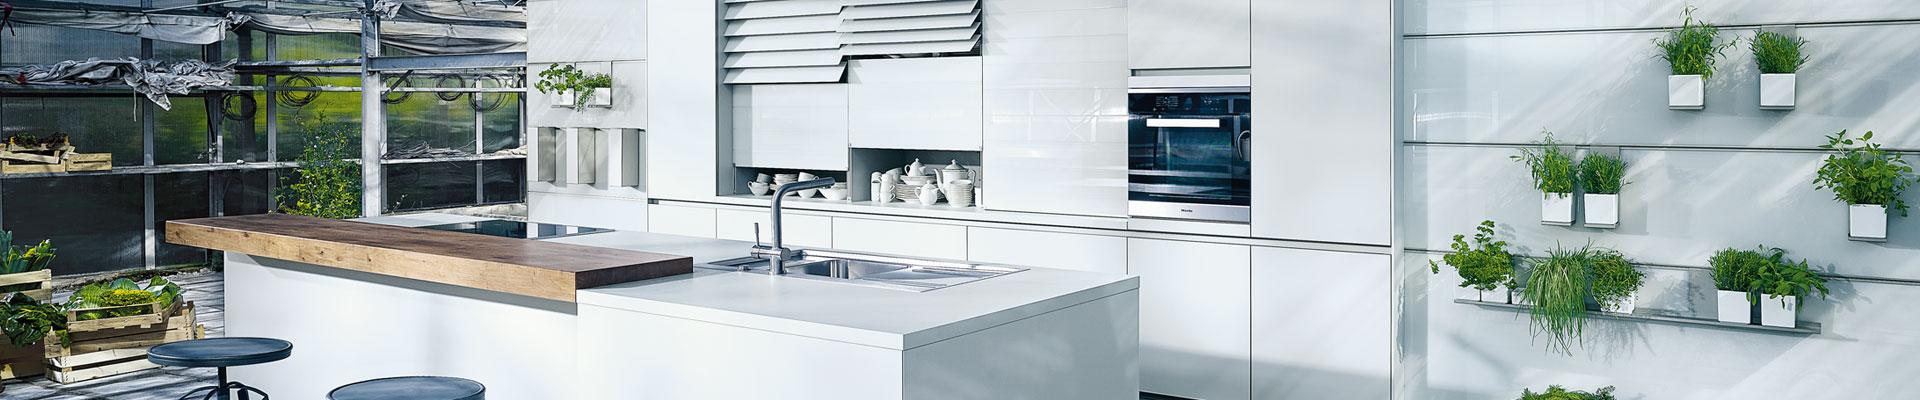 Abbildung Slide Angebote NX 902 Glass Matt Kristallgrau